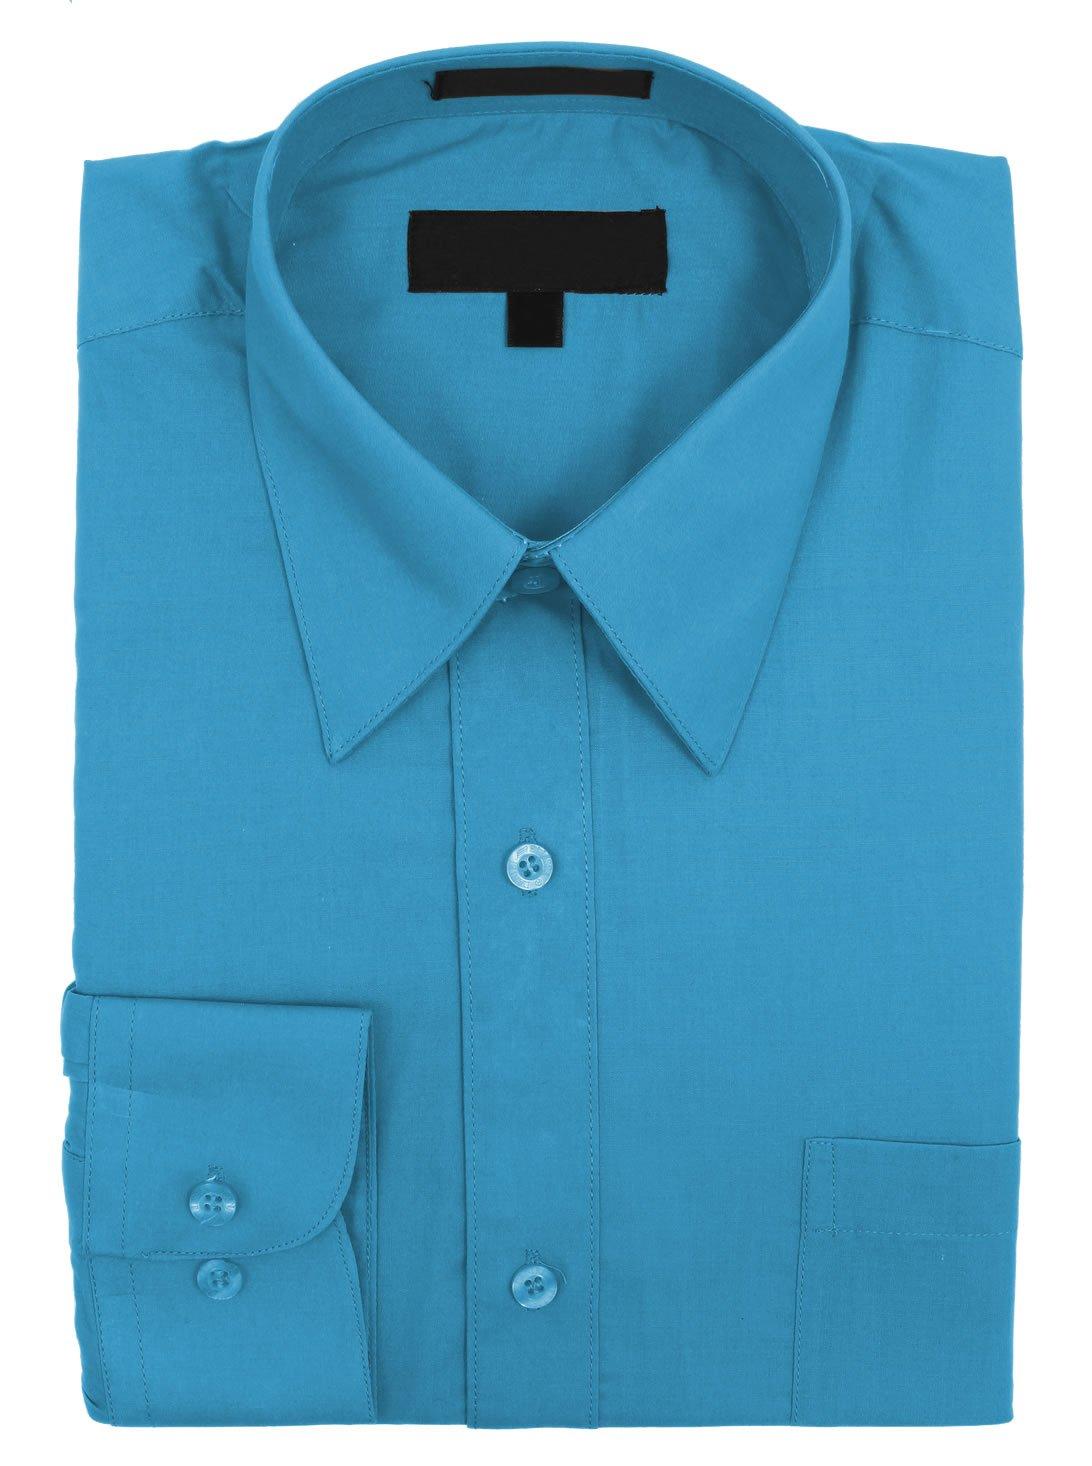 Sunrise Outlet Boys Solid Color Cotton Blend Dress Shirt NTP-BS3001